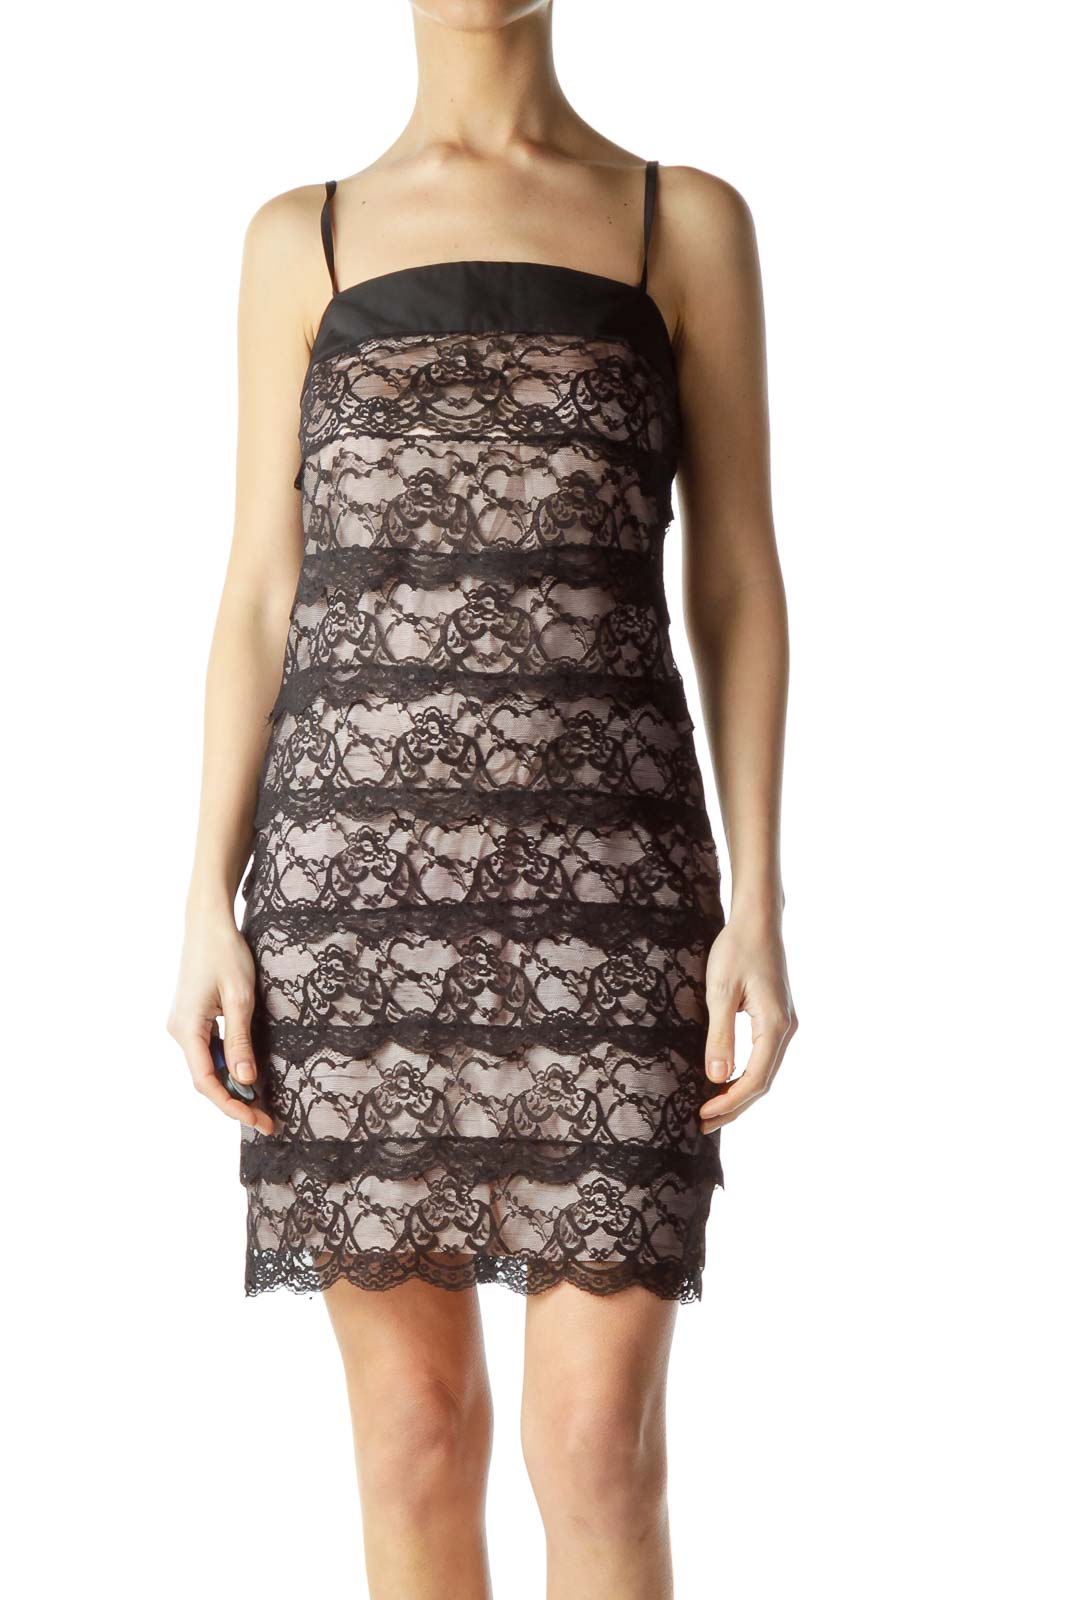 Black Pink Lace Spaghetti Strap Dress